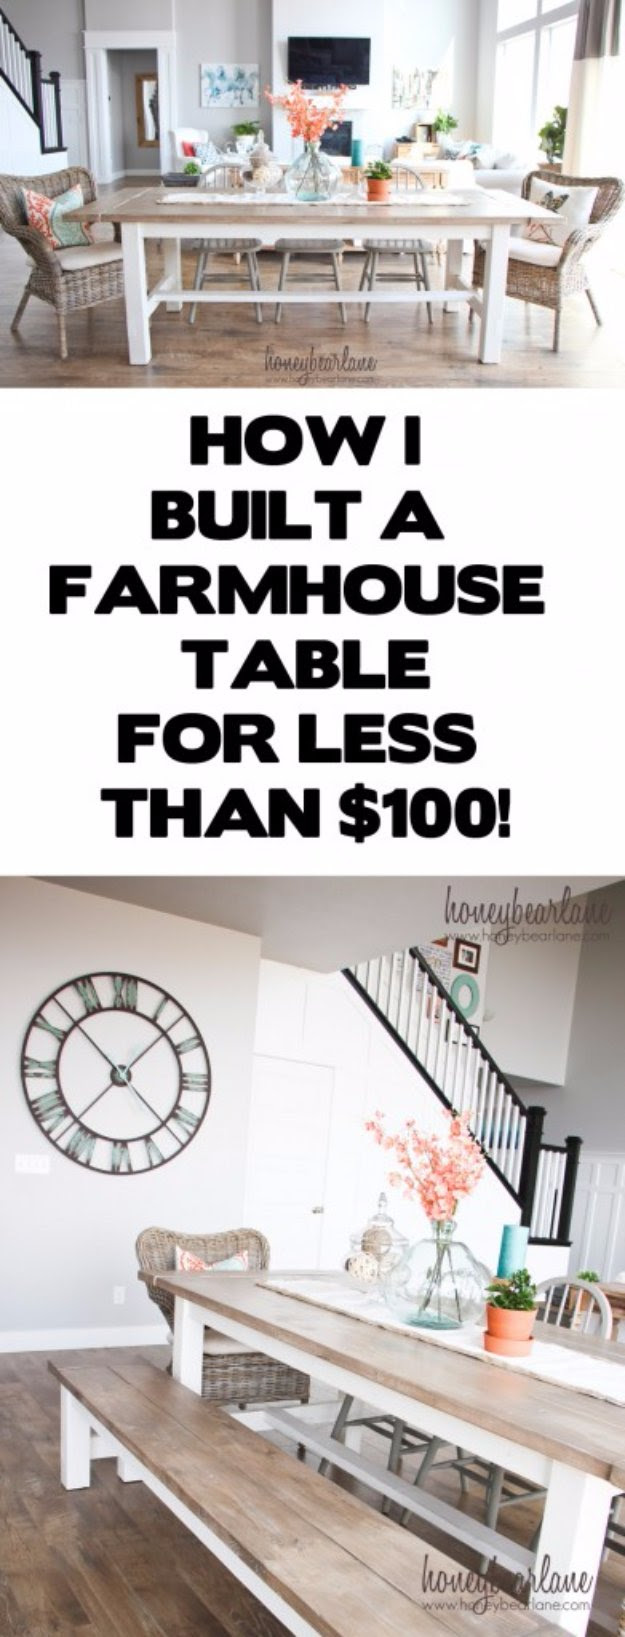 36 DIY Dining Room Decor Ideas DIY Joy